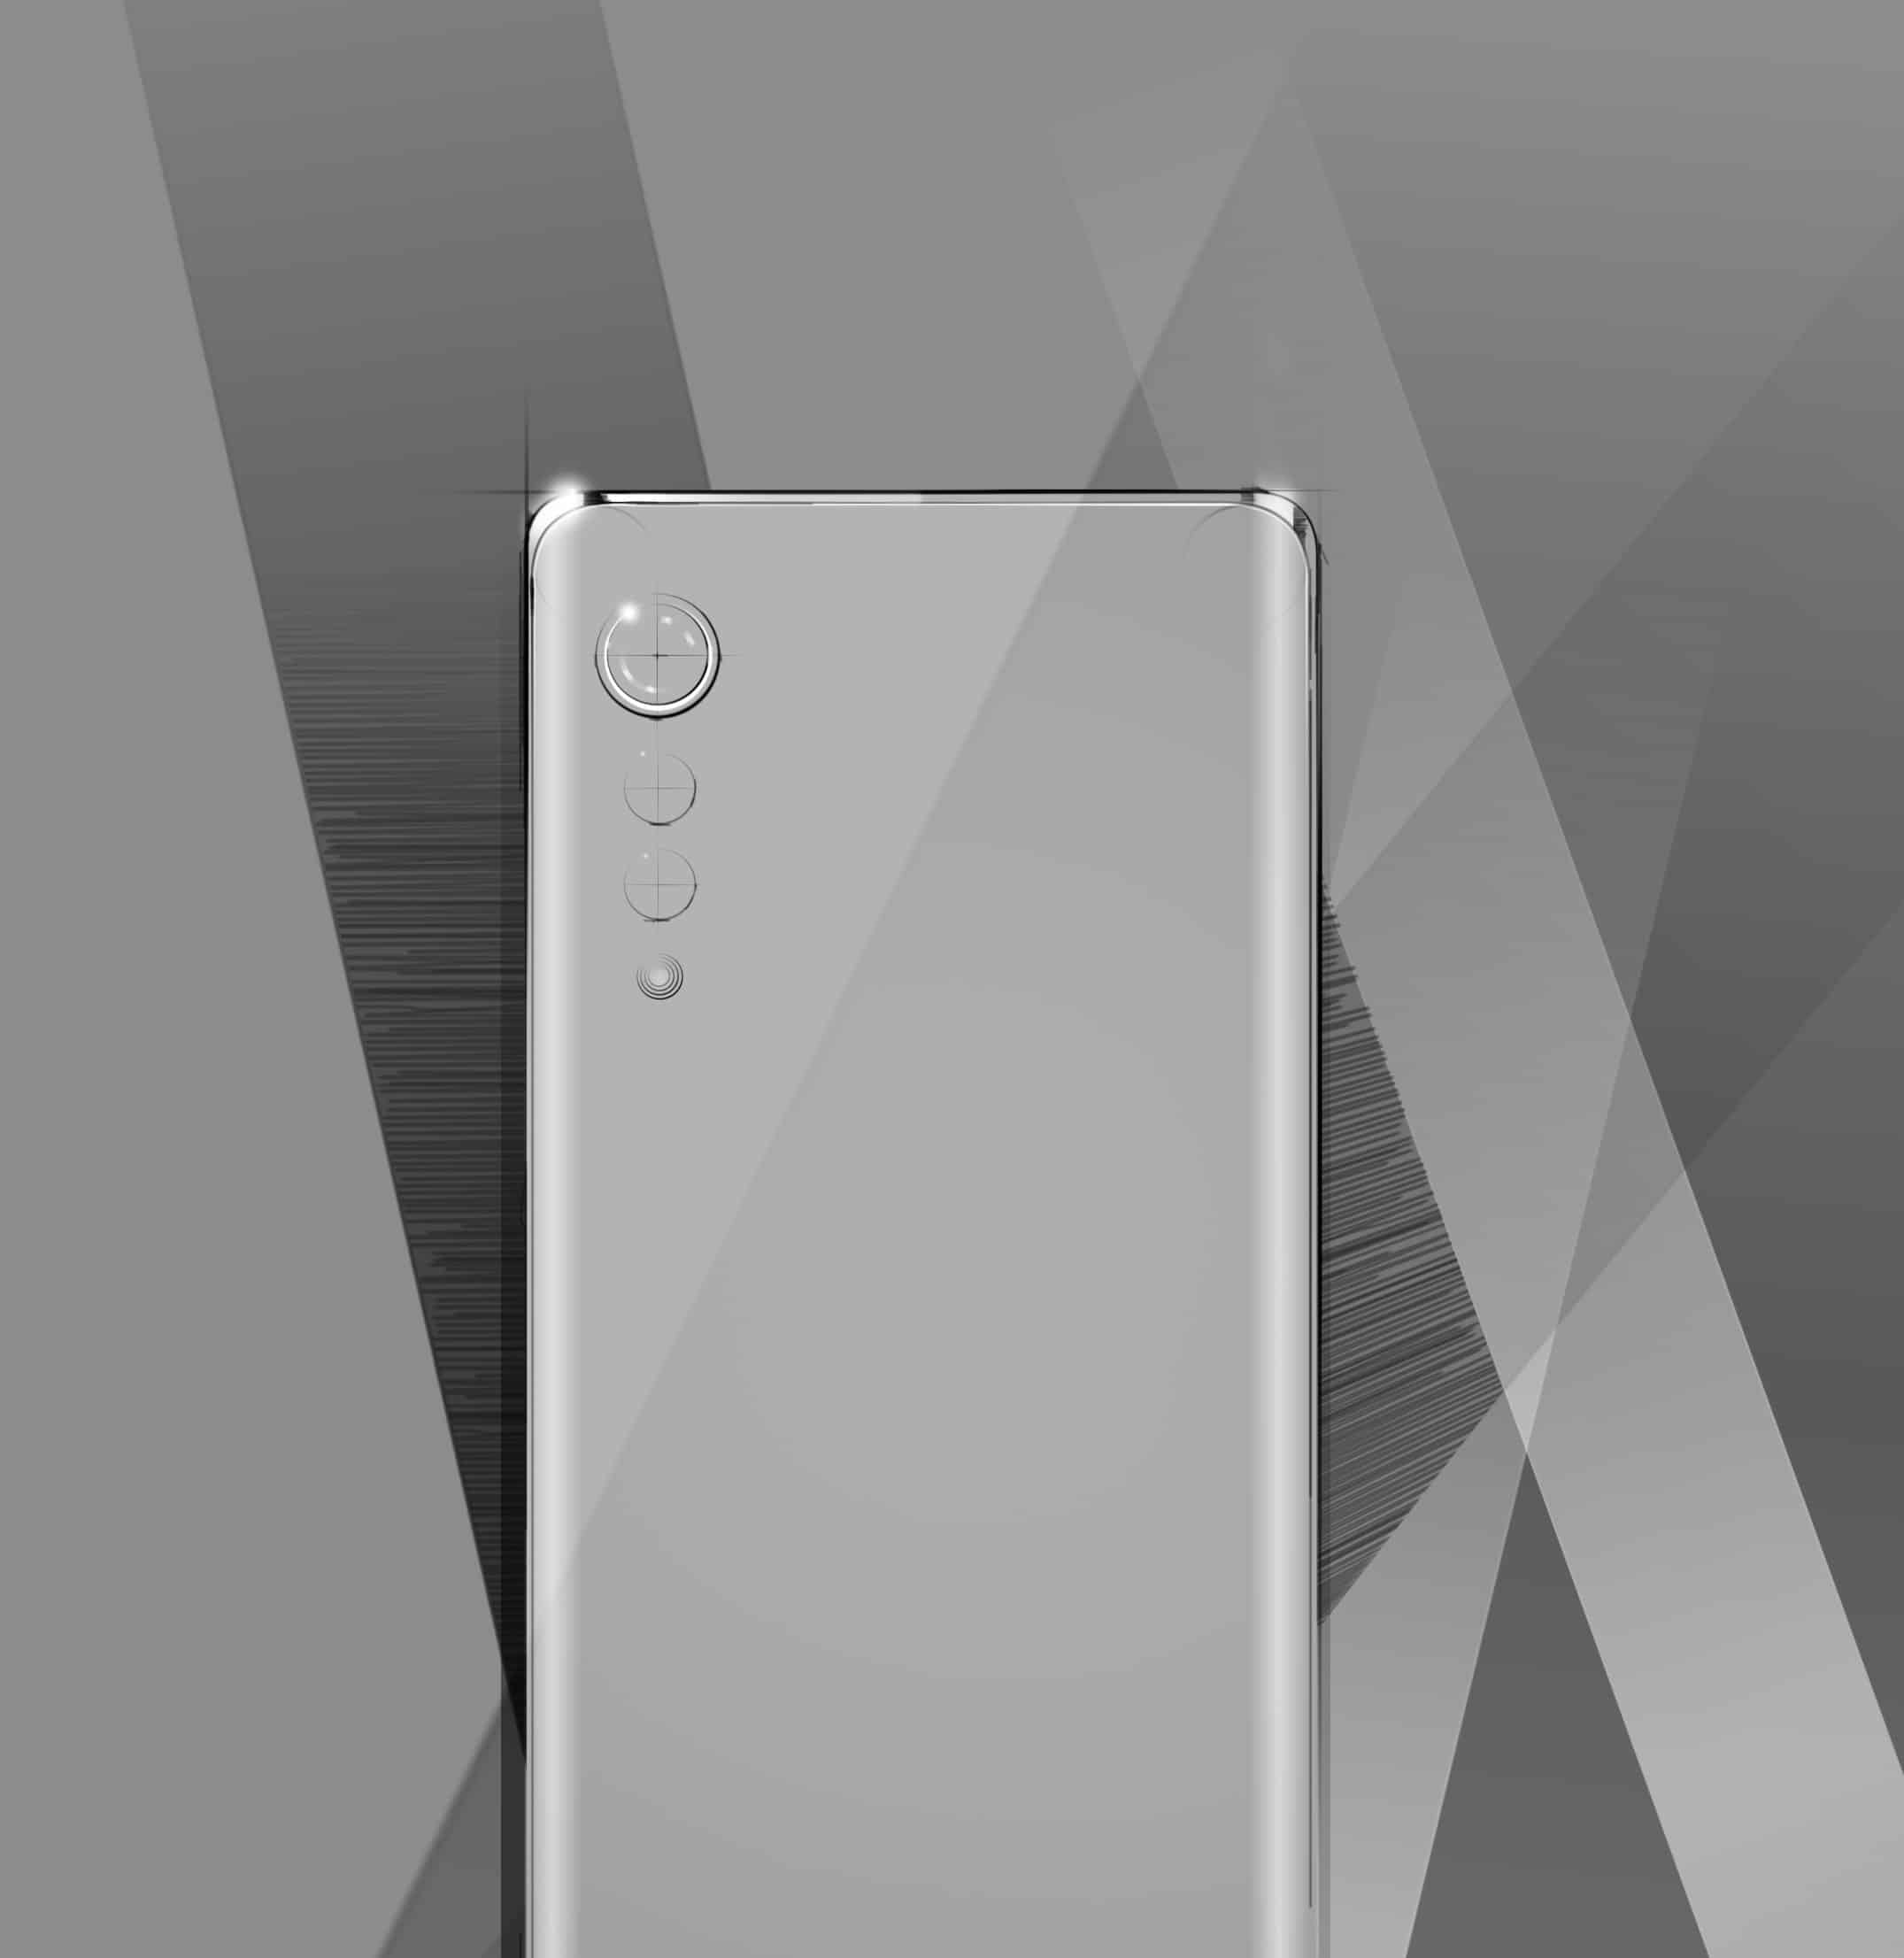 LG new smartphone design language April 2020 image 2